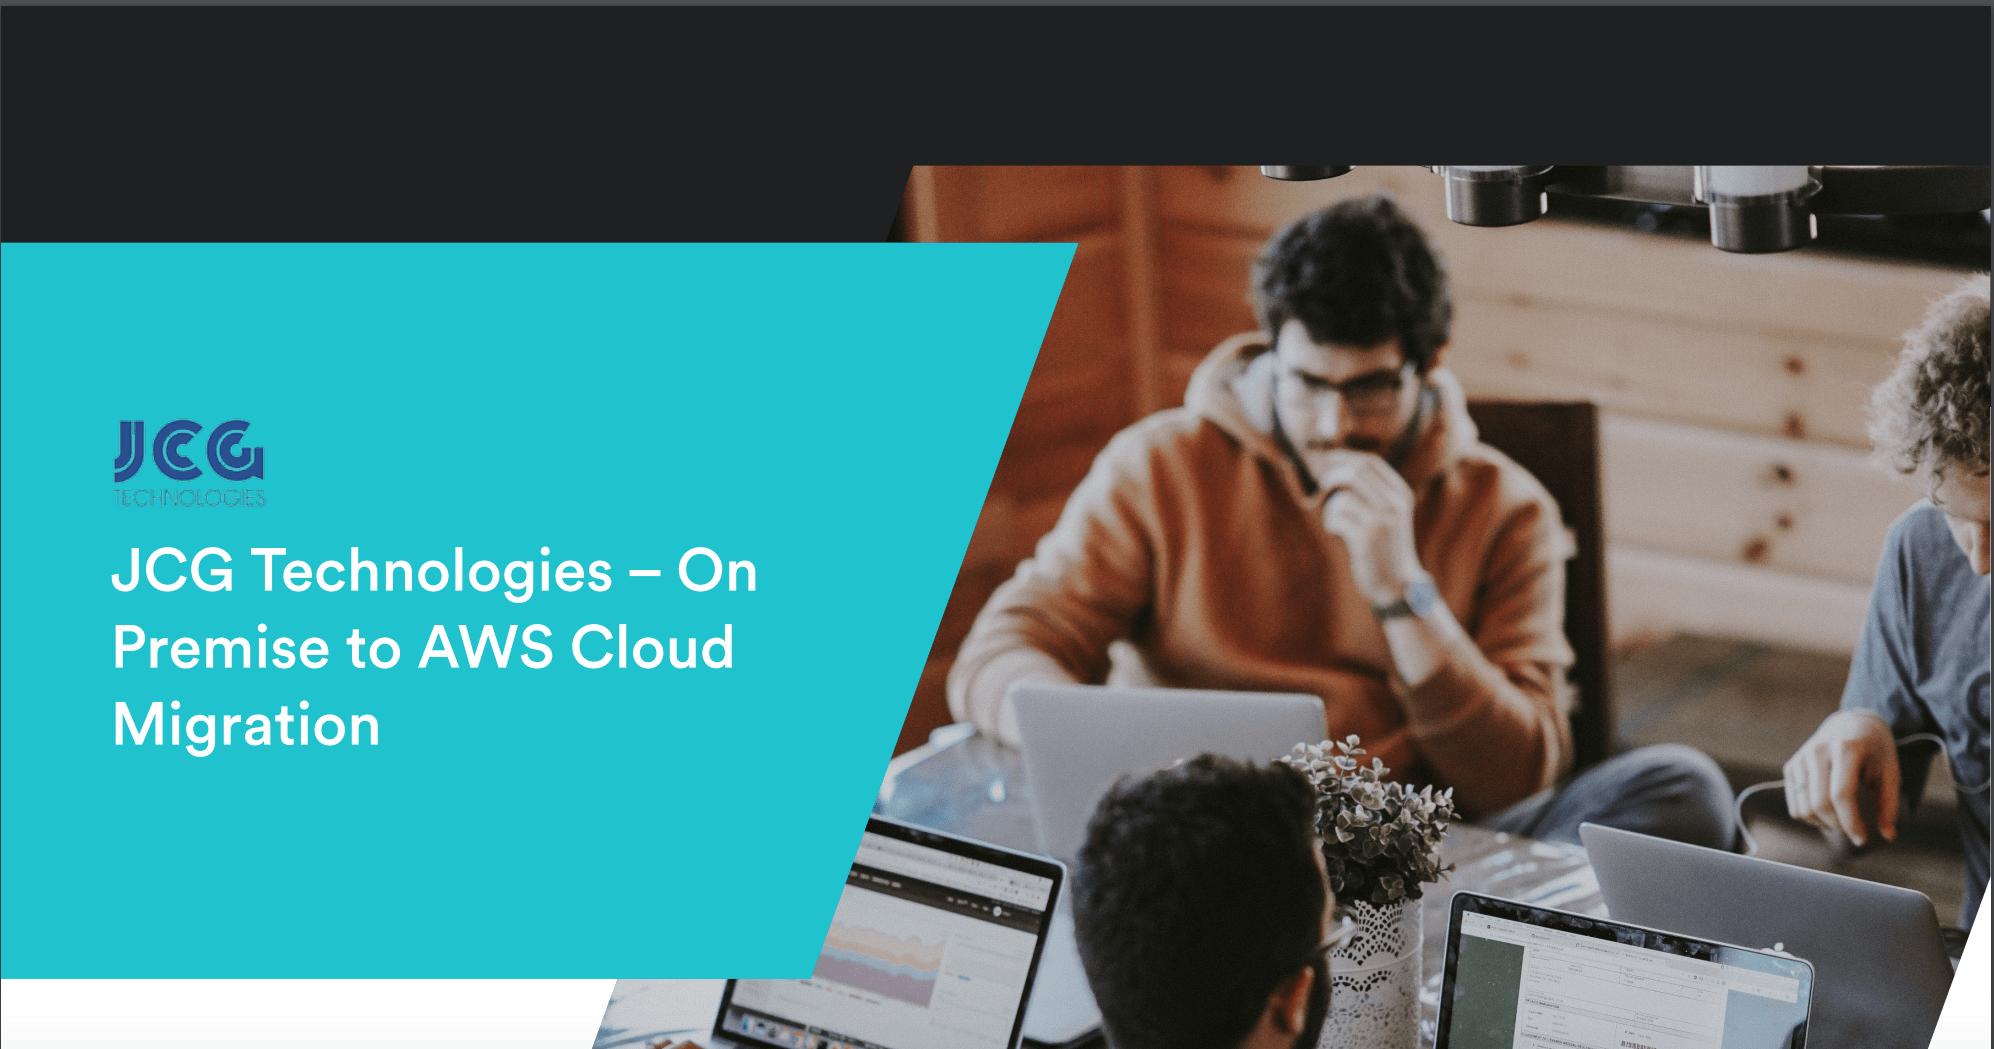 JCG Technologies – On Premise to AWS Cloud Migration